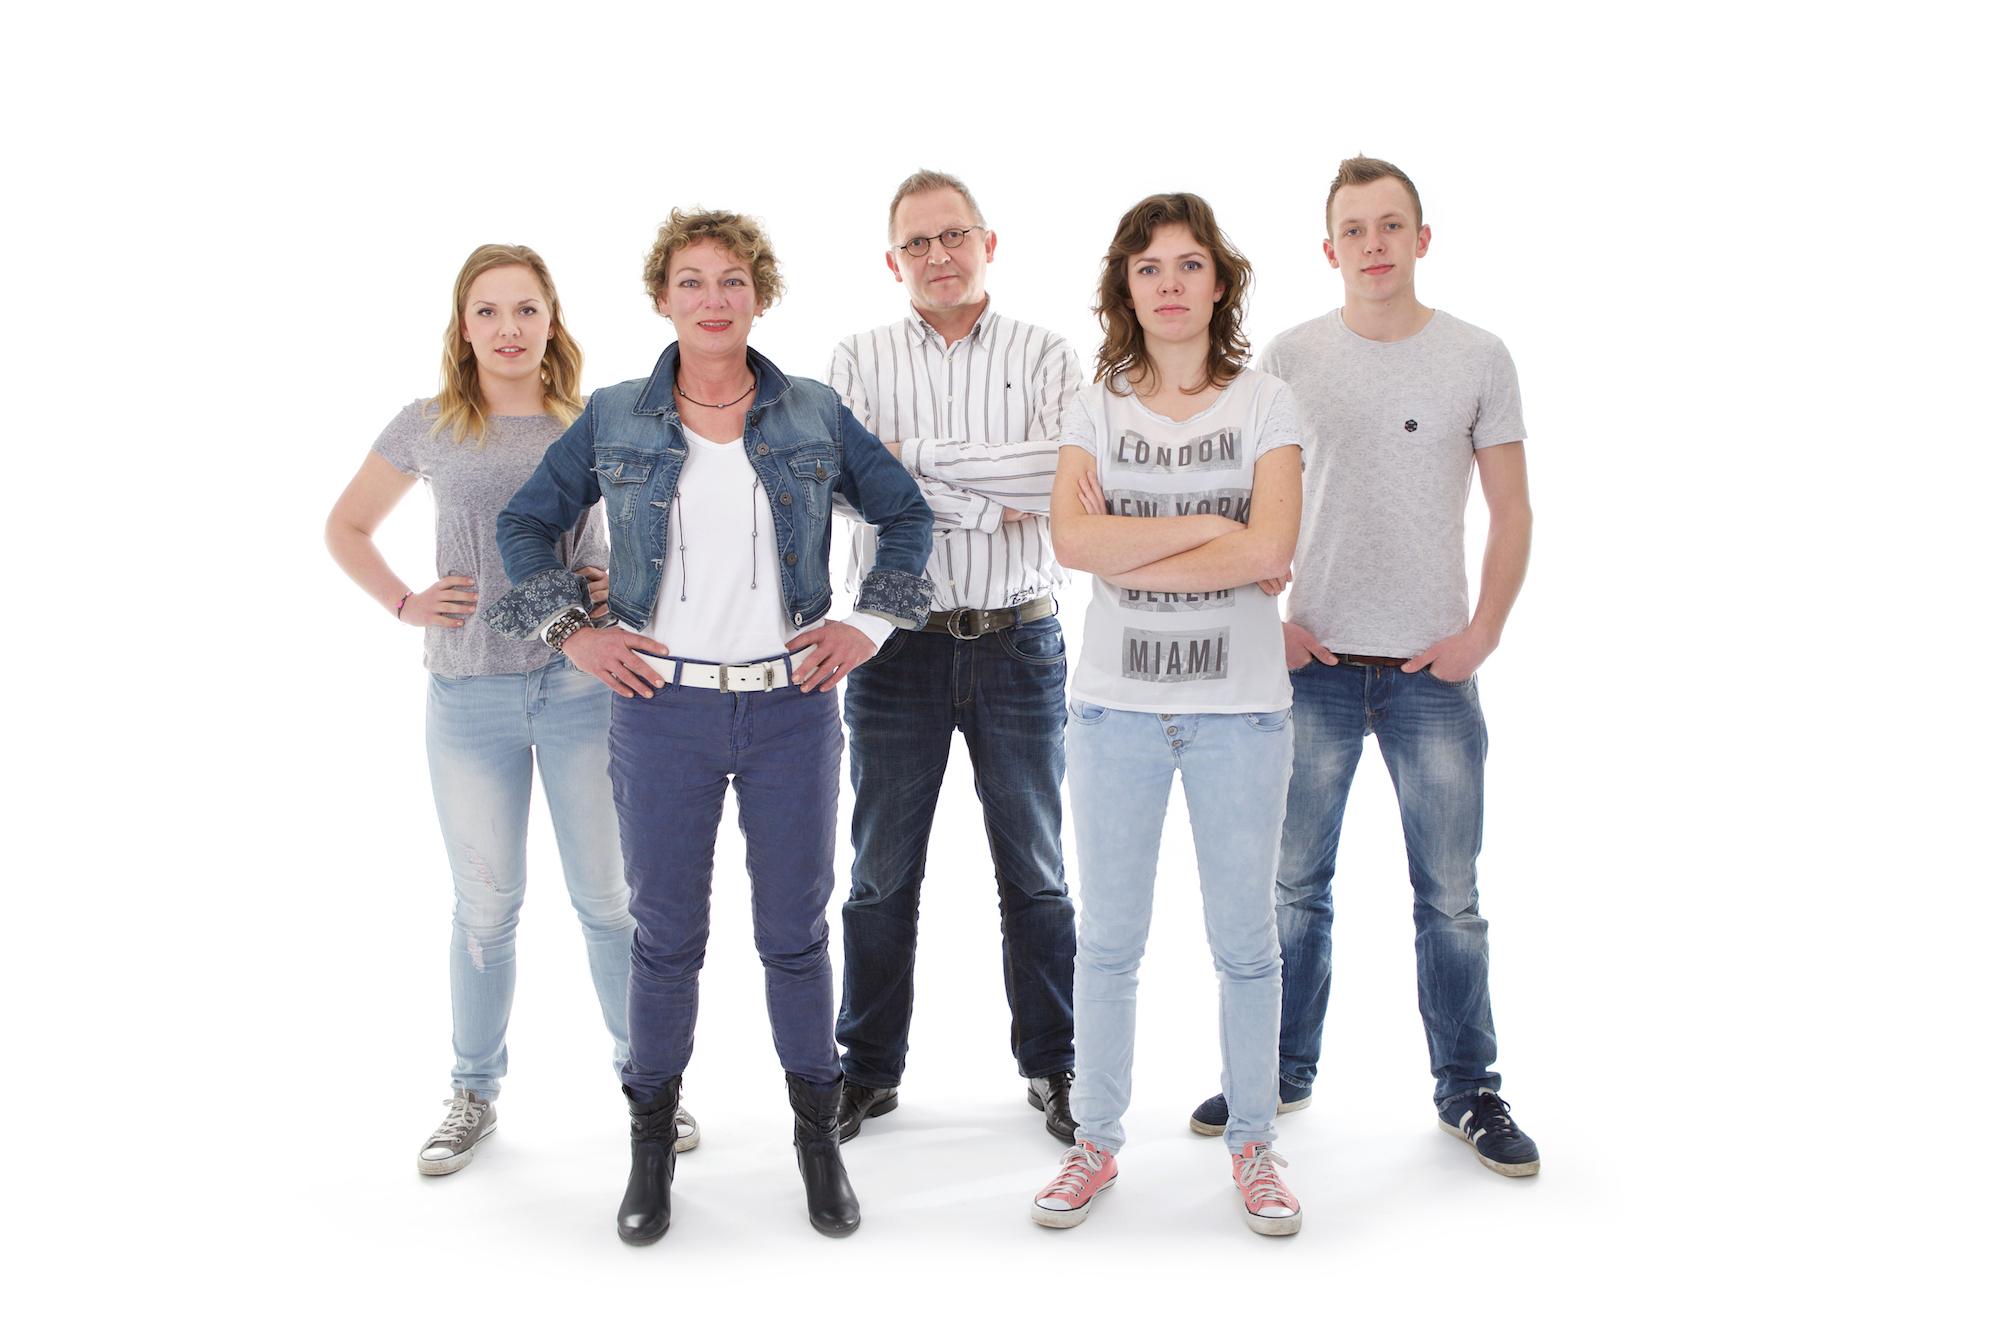 fotografie fotoshoot Groningen familie